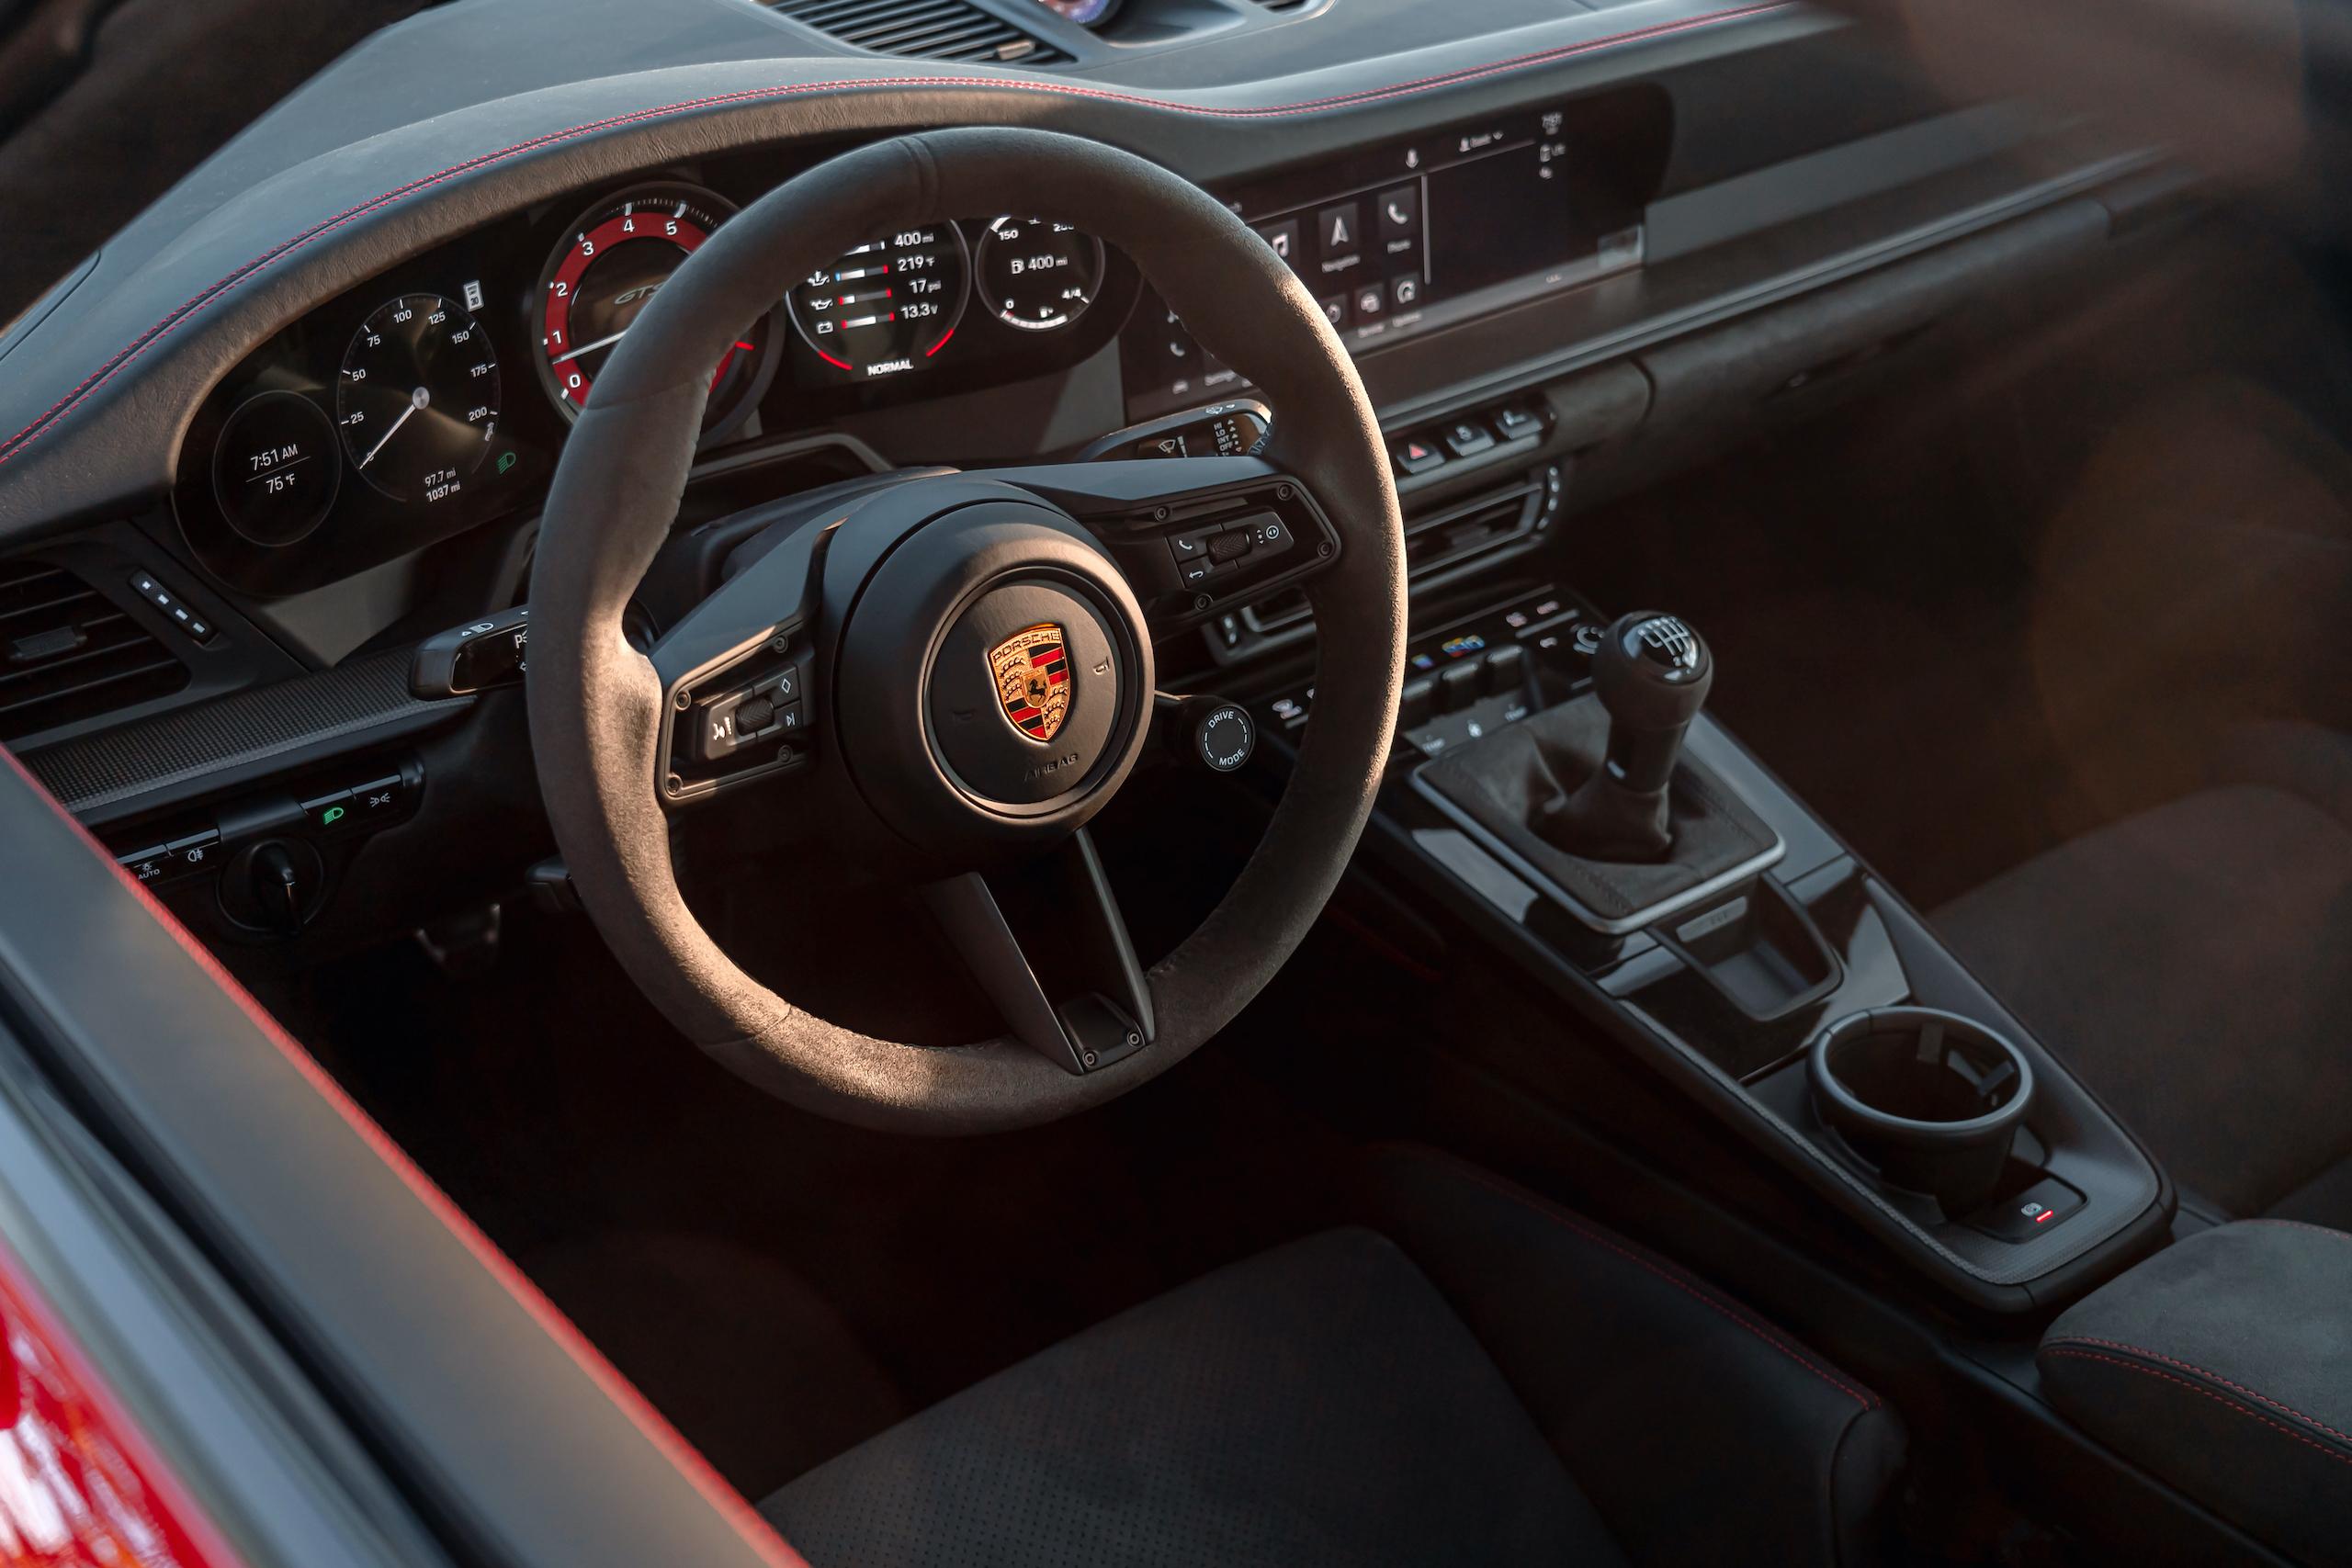 Porsche 911 GTS interior driver cockpit